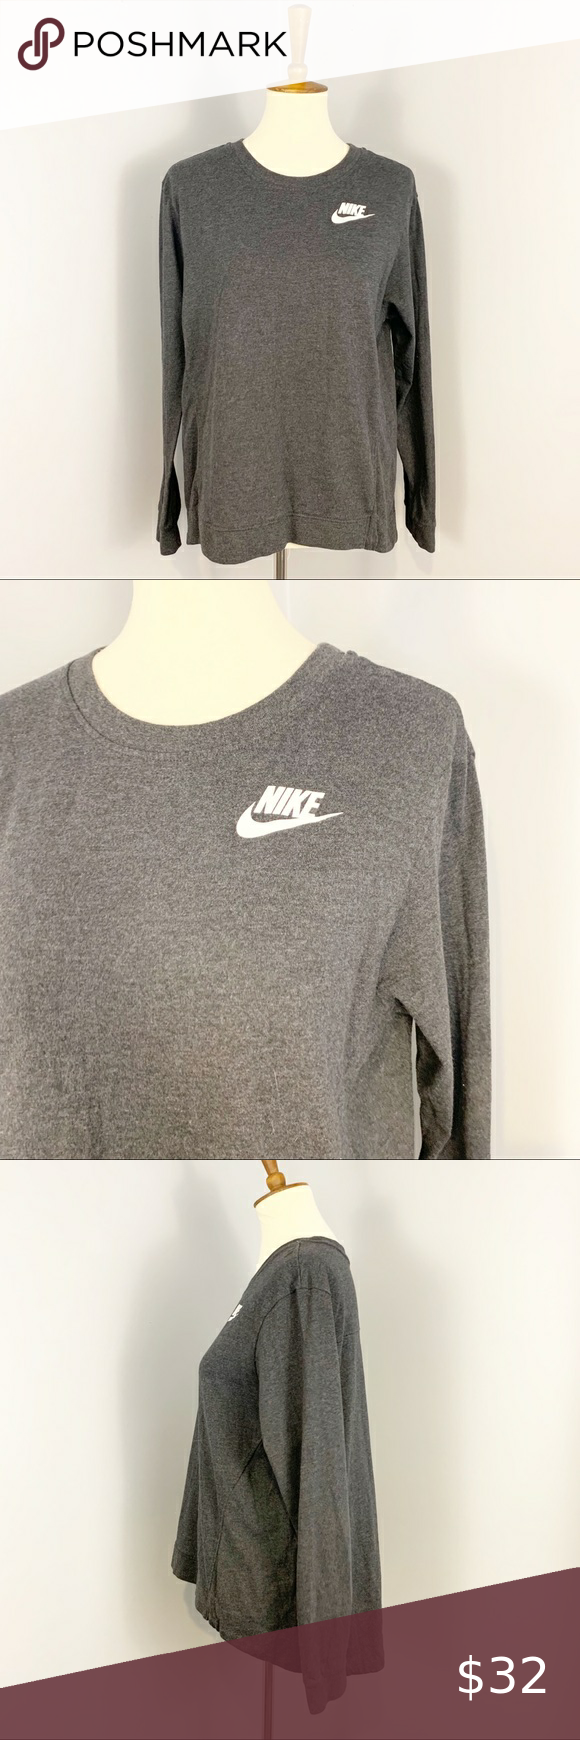 Nike Dark Gray Crewneck Sweatshirt Dark Gray Crewneck Sweatshirt From Nike Very Good Used Condition No Rips Or Sweatshirts Crew Neck Sweatshirt Clothes Design [ 1740 x 580 Pixel ]